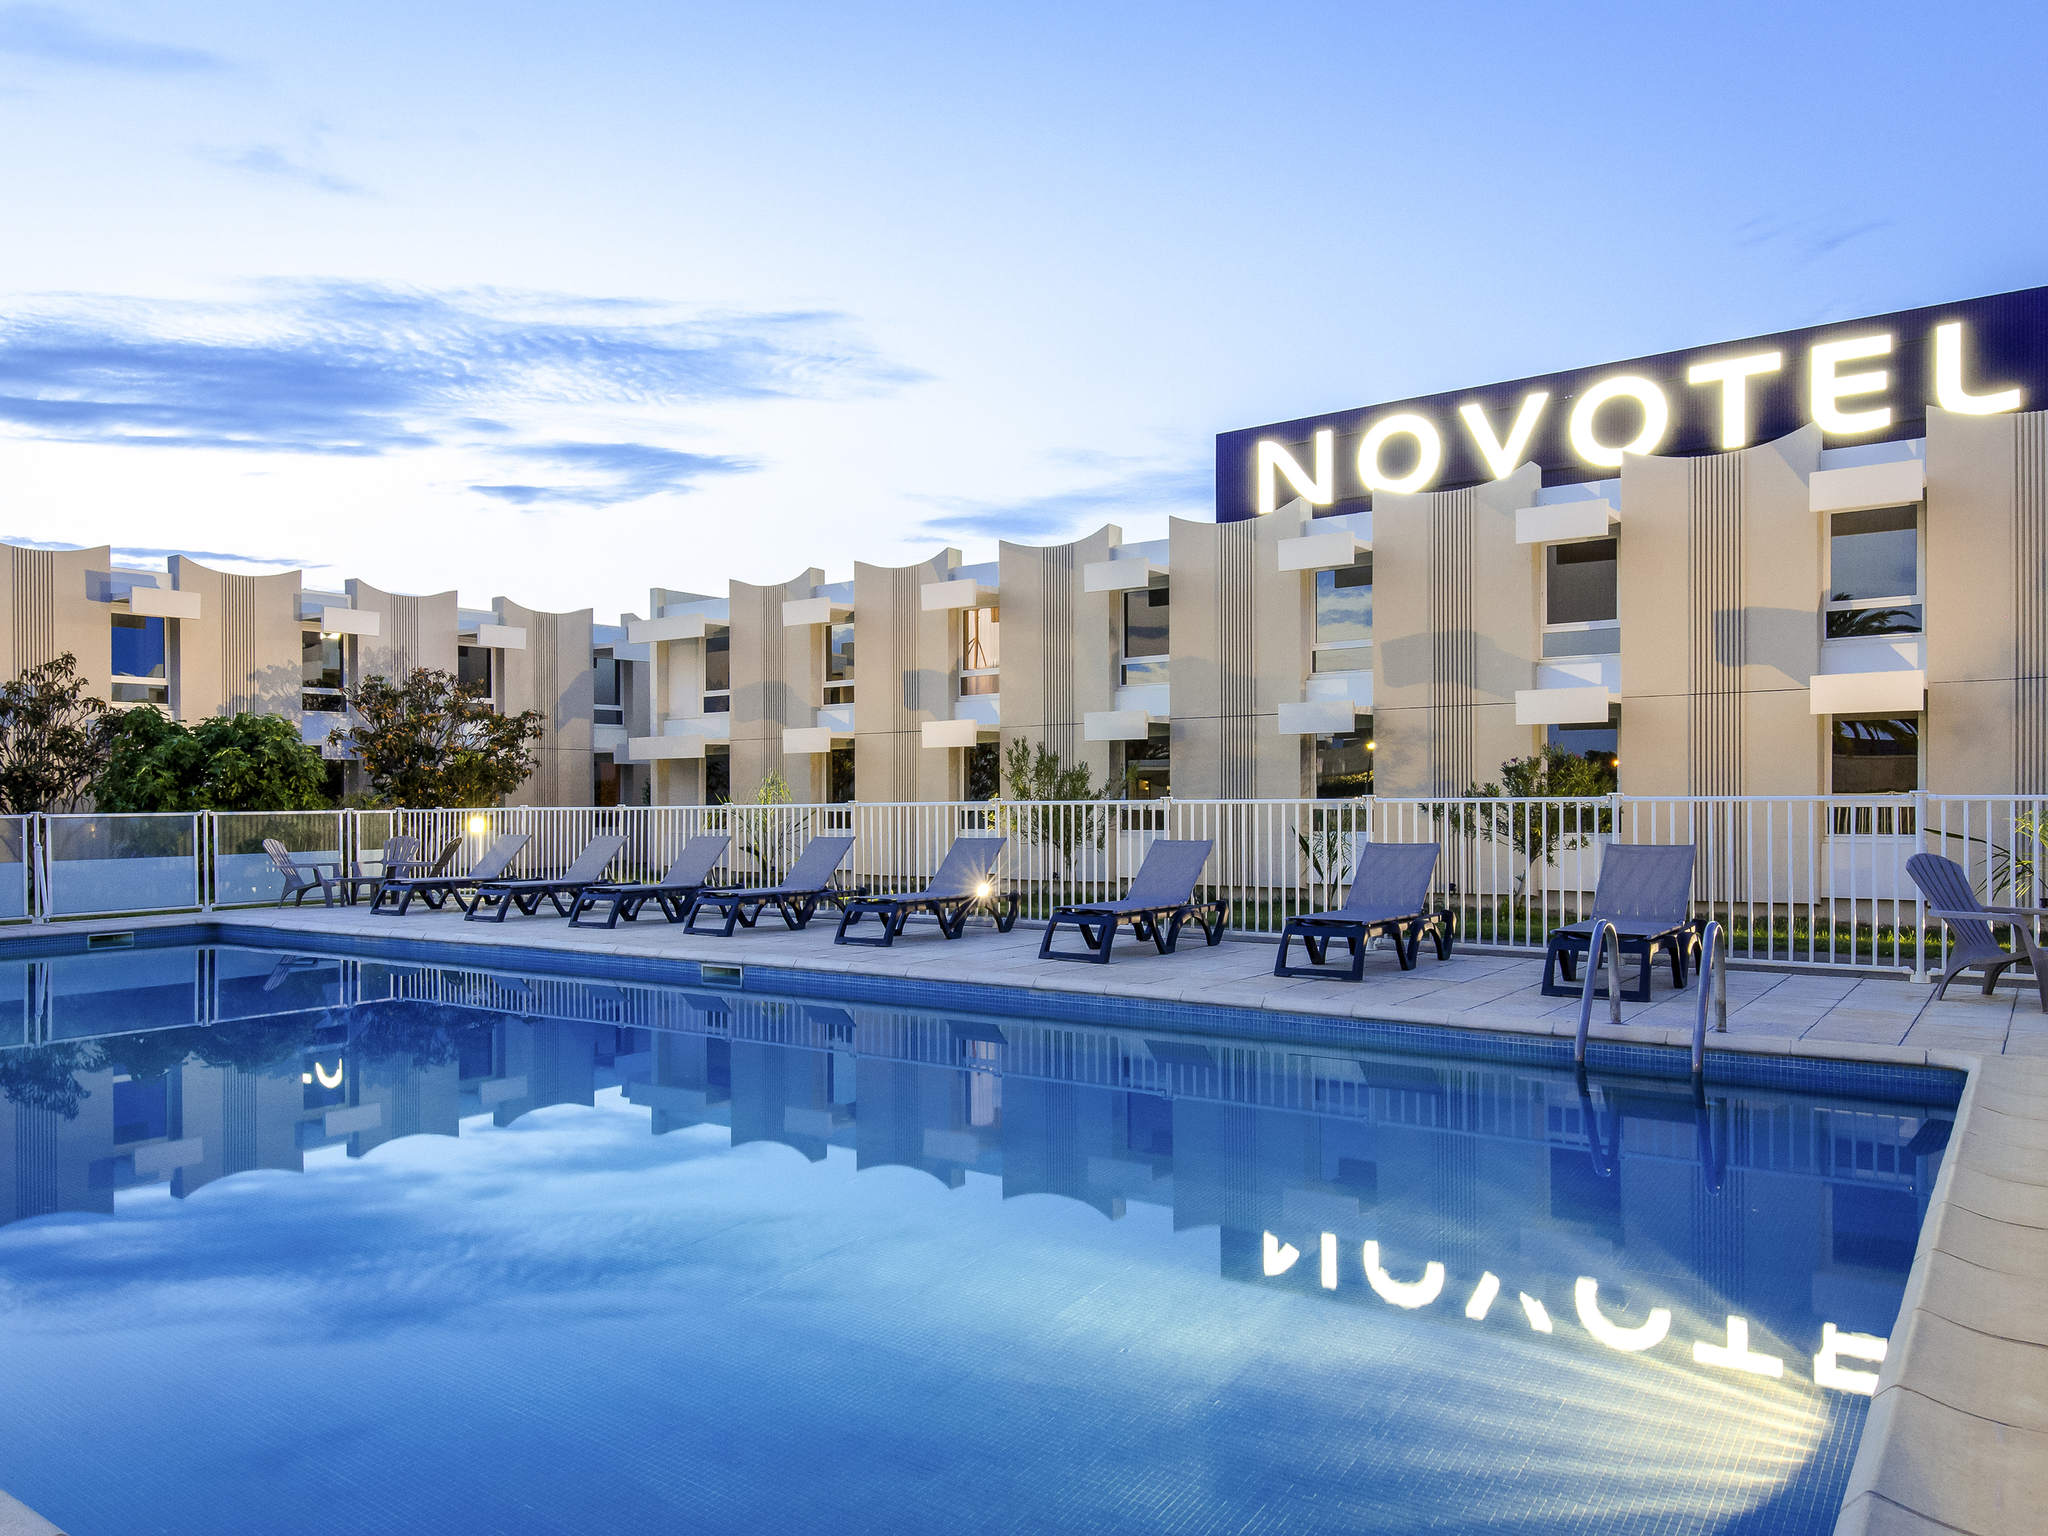 Hôtel - Novotel Perpignan